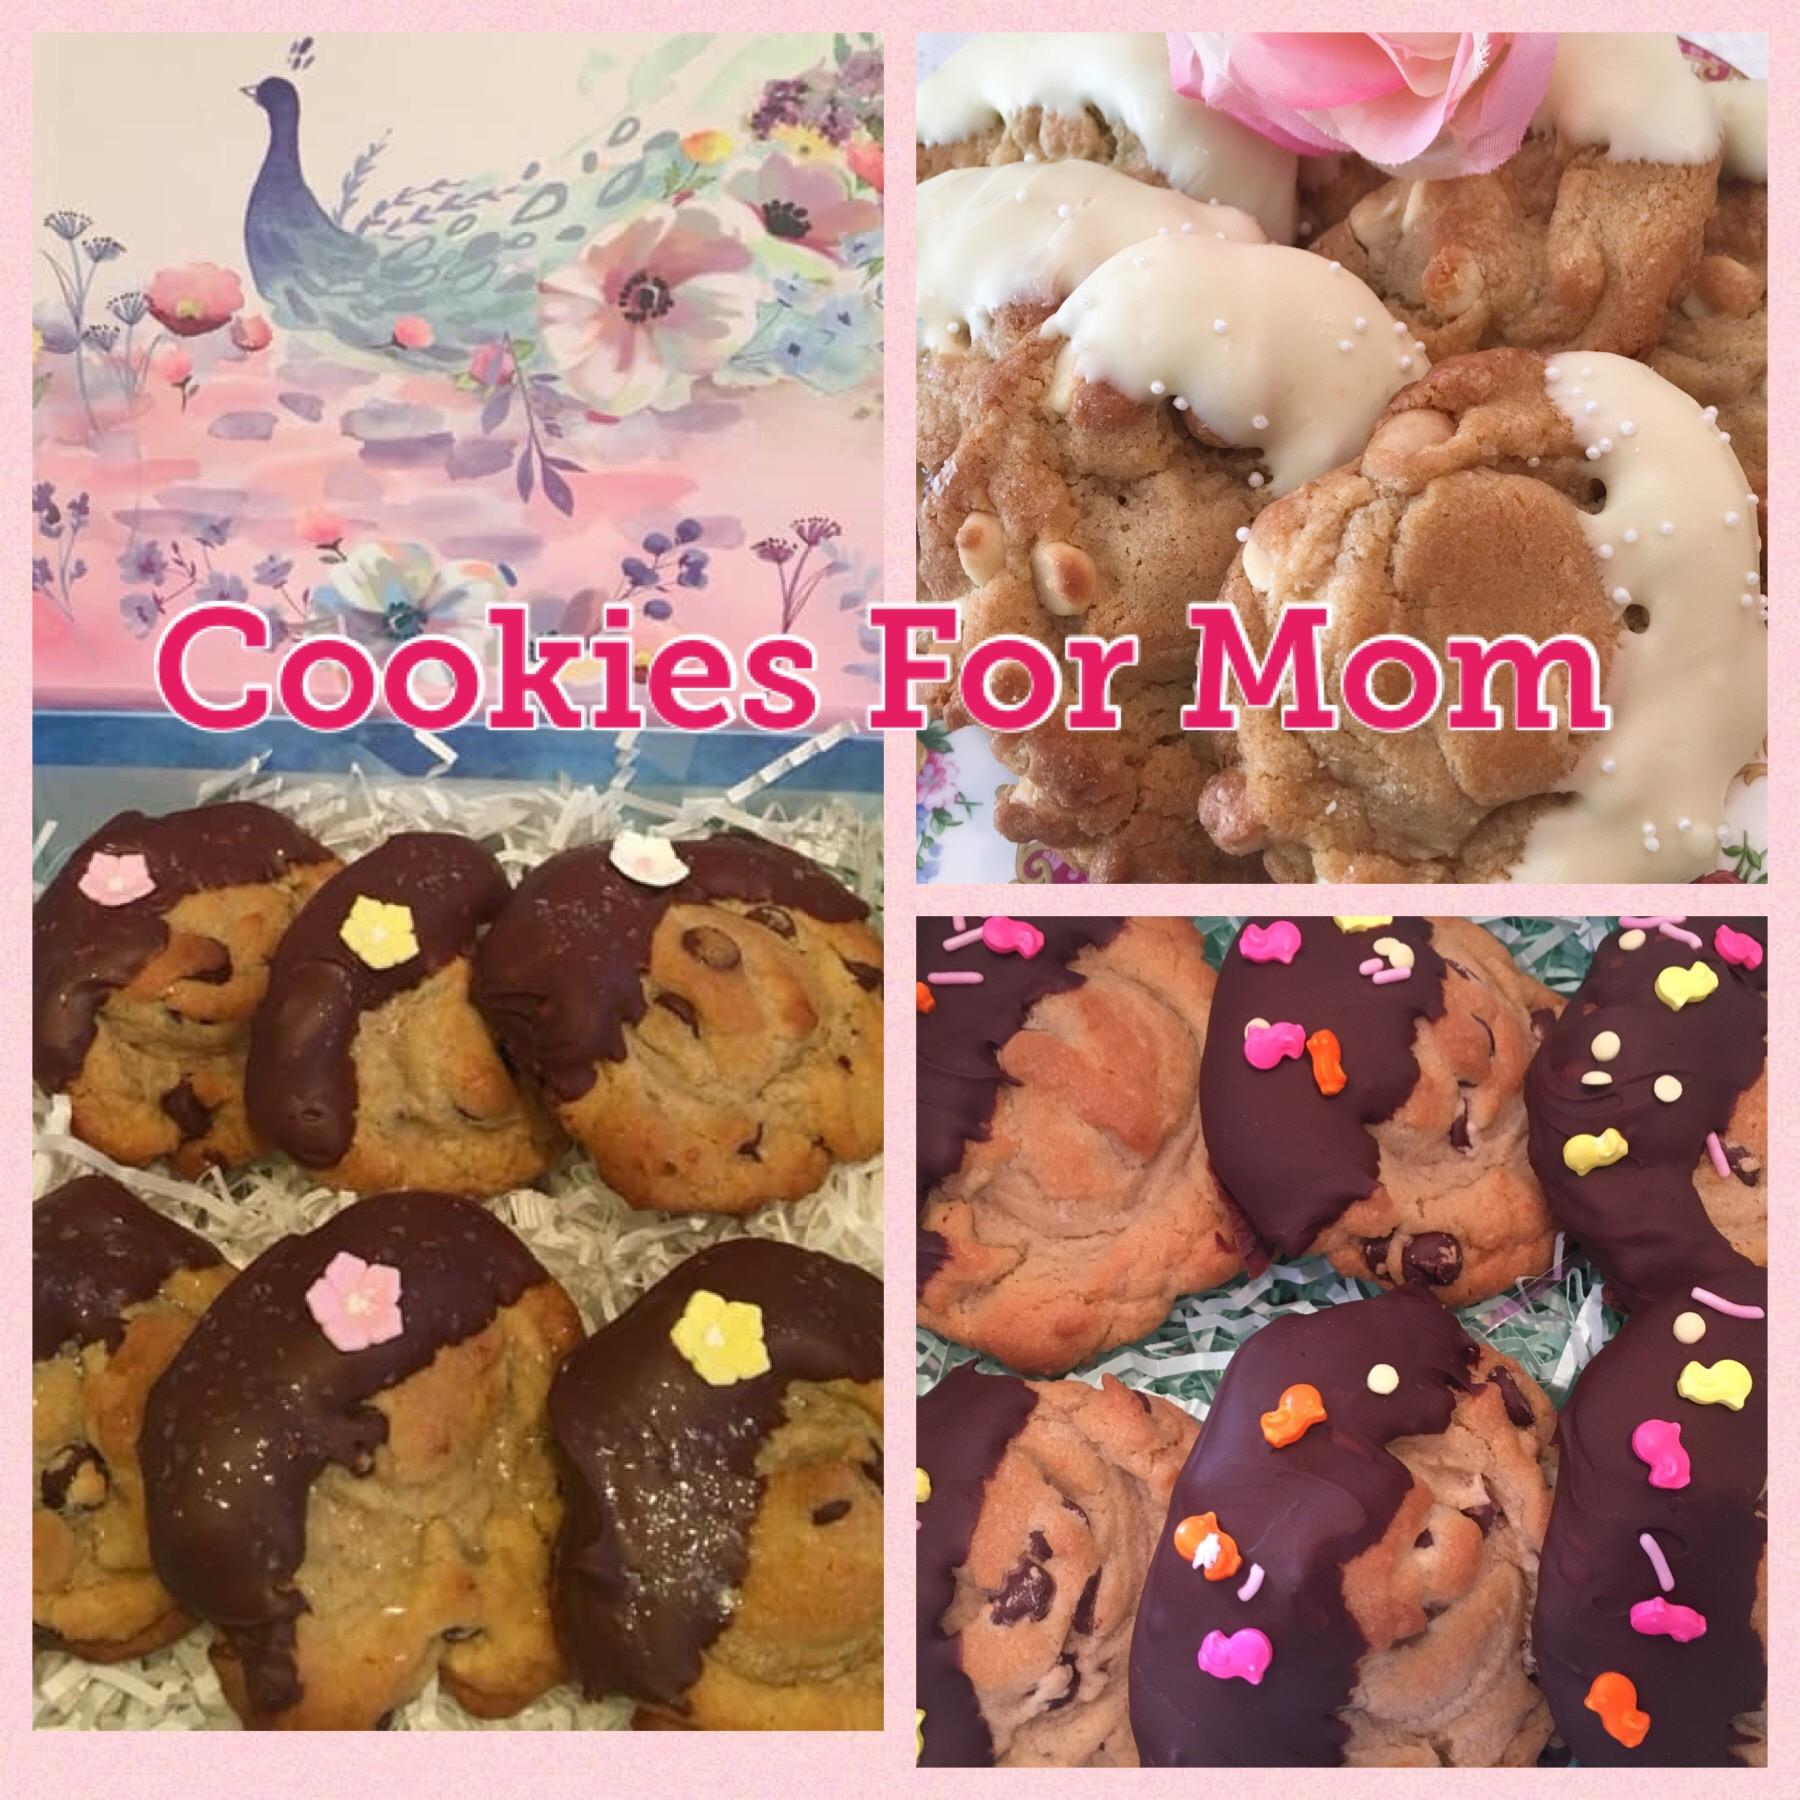 CookiesForMom